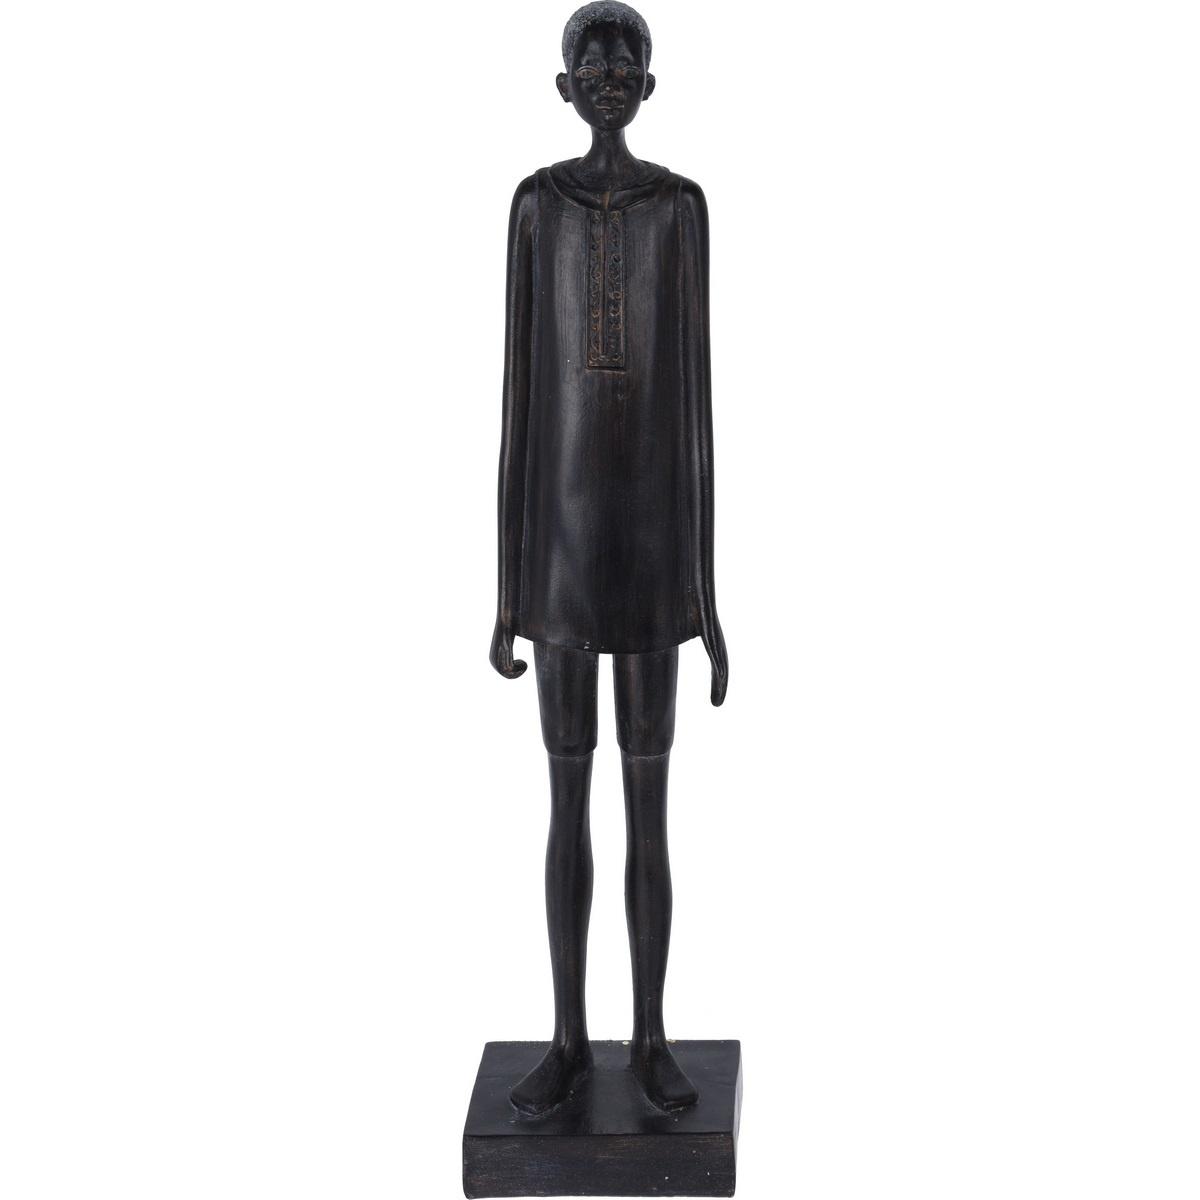 Koopman Dekorativní soška African man, 40 cm